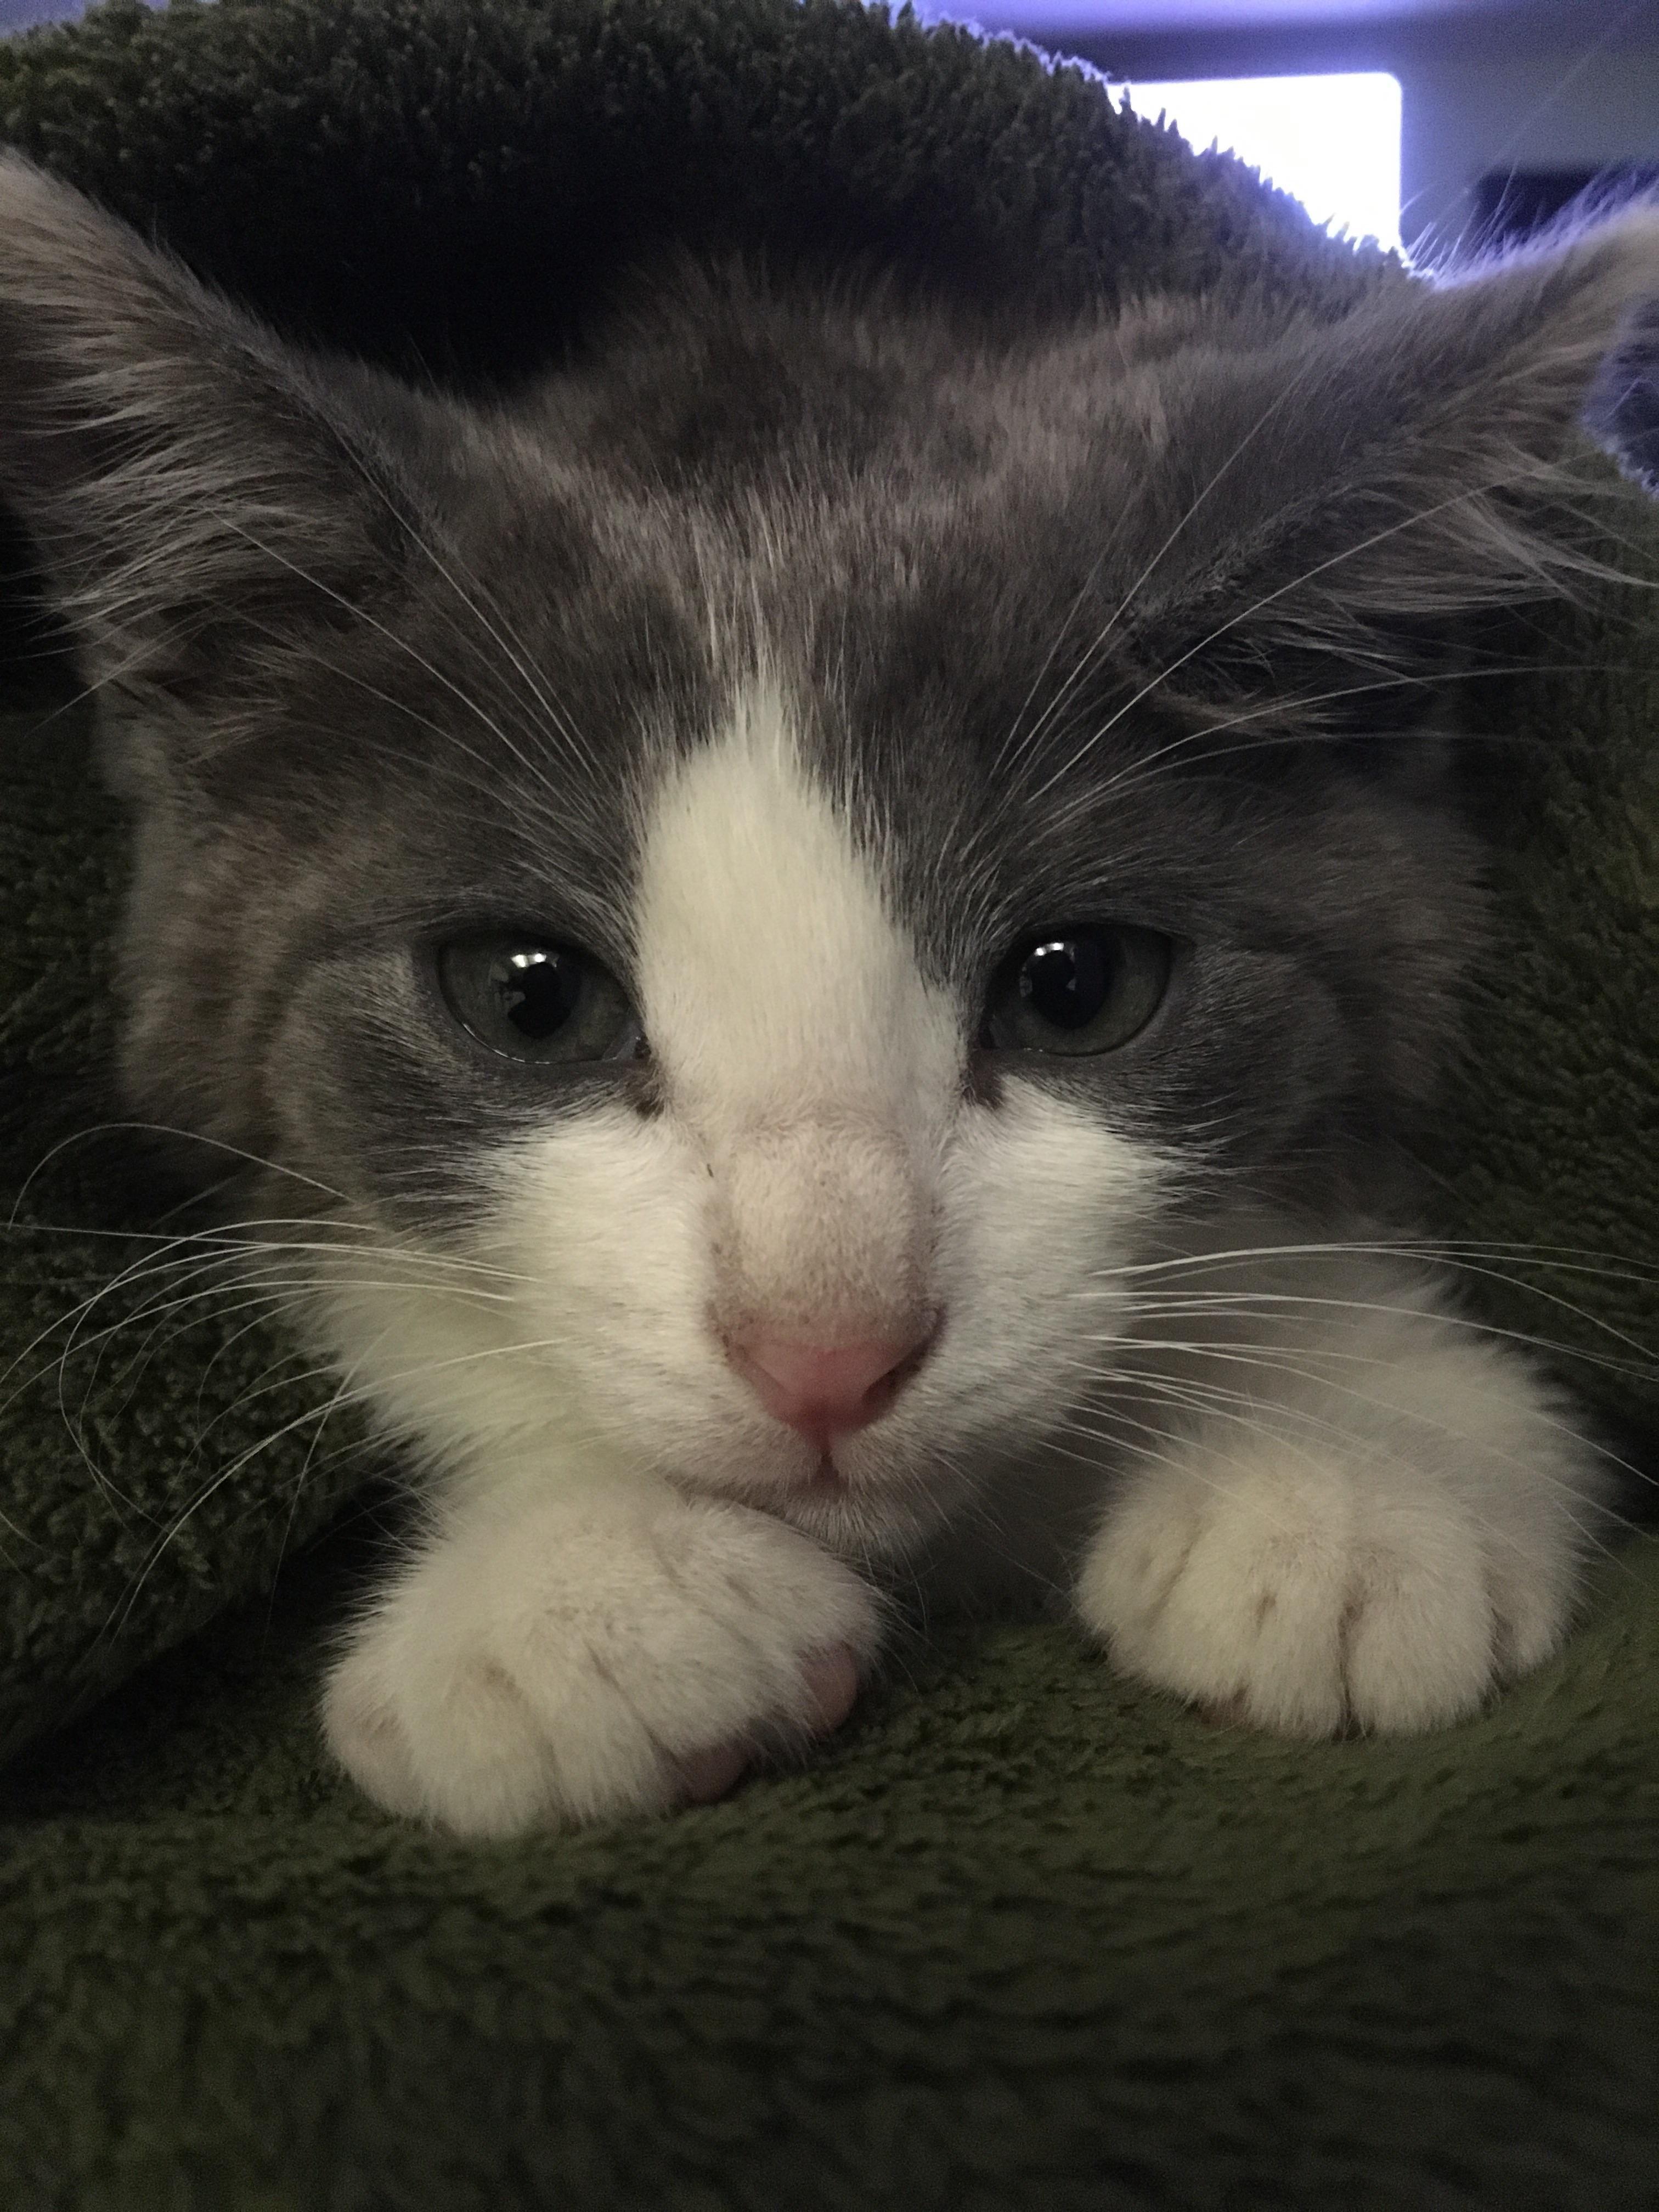 Got A New Roommate Names John Rambo Cats And Kittens Here Kitty Kitty I Love Cats